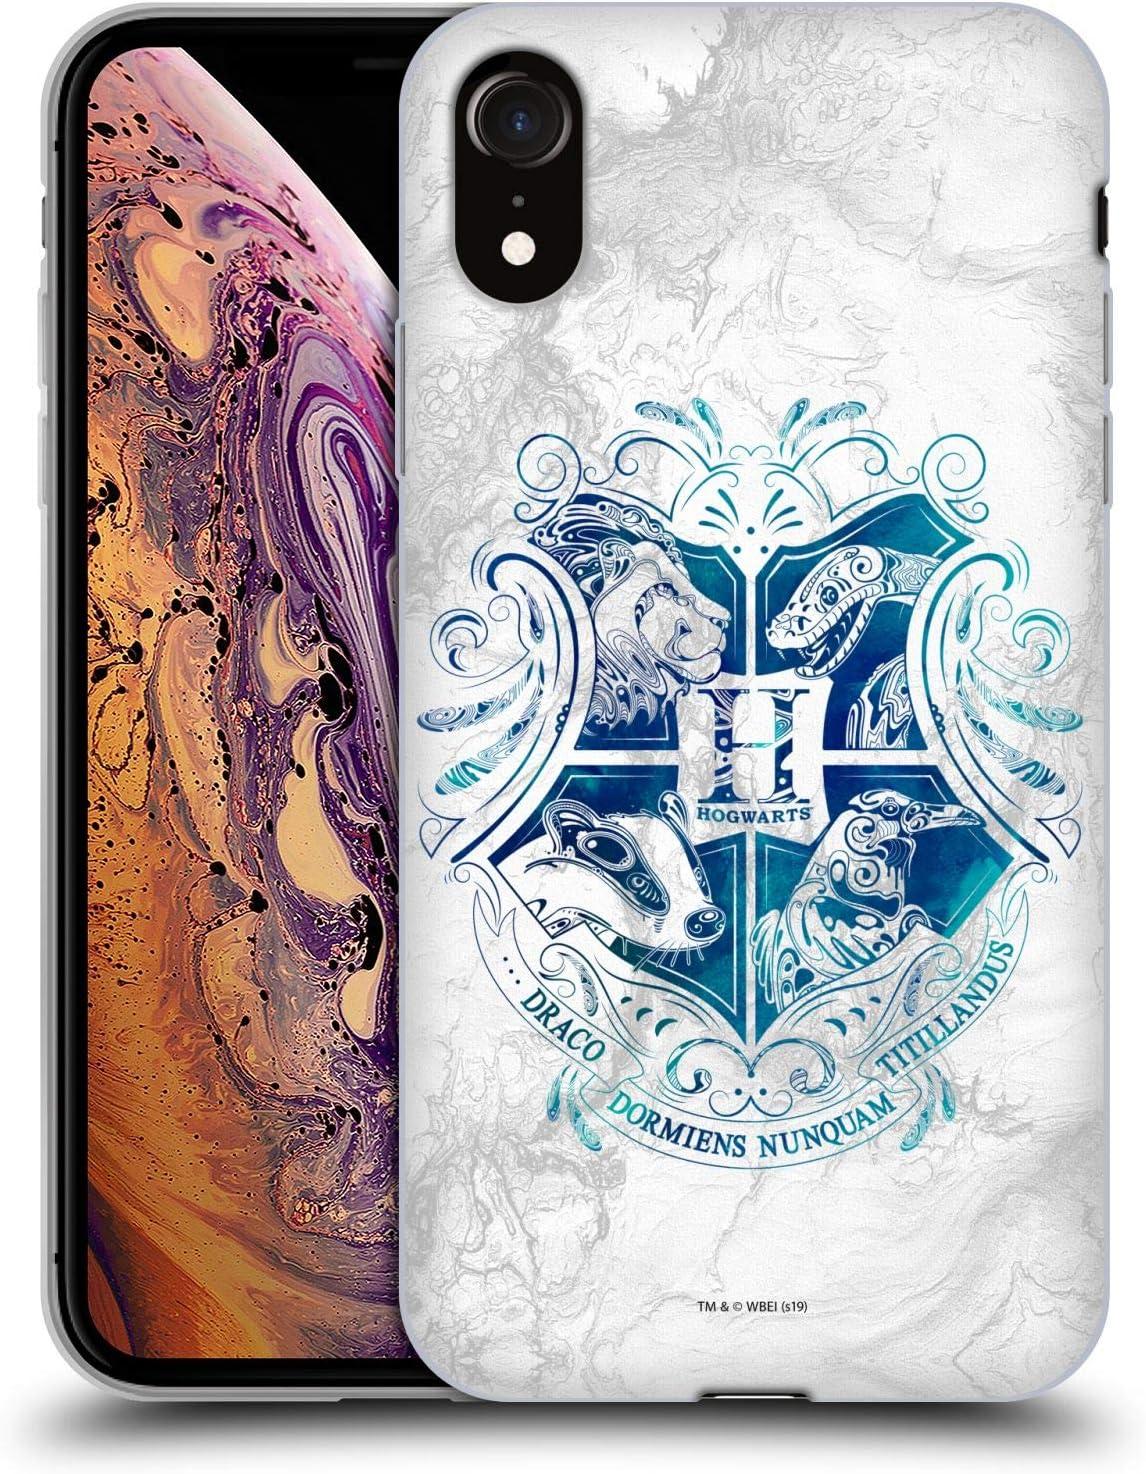 Head Case Designs Offiziell Zugelassen Harry Potter Hogwarts Aguamenti Deathly Hallows Ix Soft Gel Handyhülle Hülle Huelle Kompatibel Mit Apple Iphone Xr Elektronik